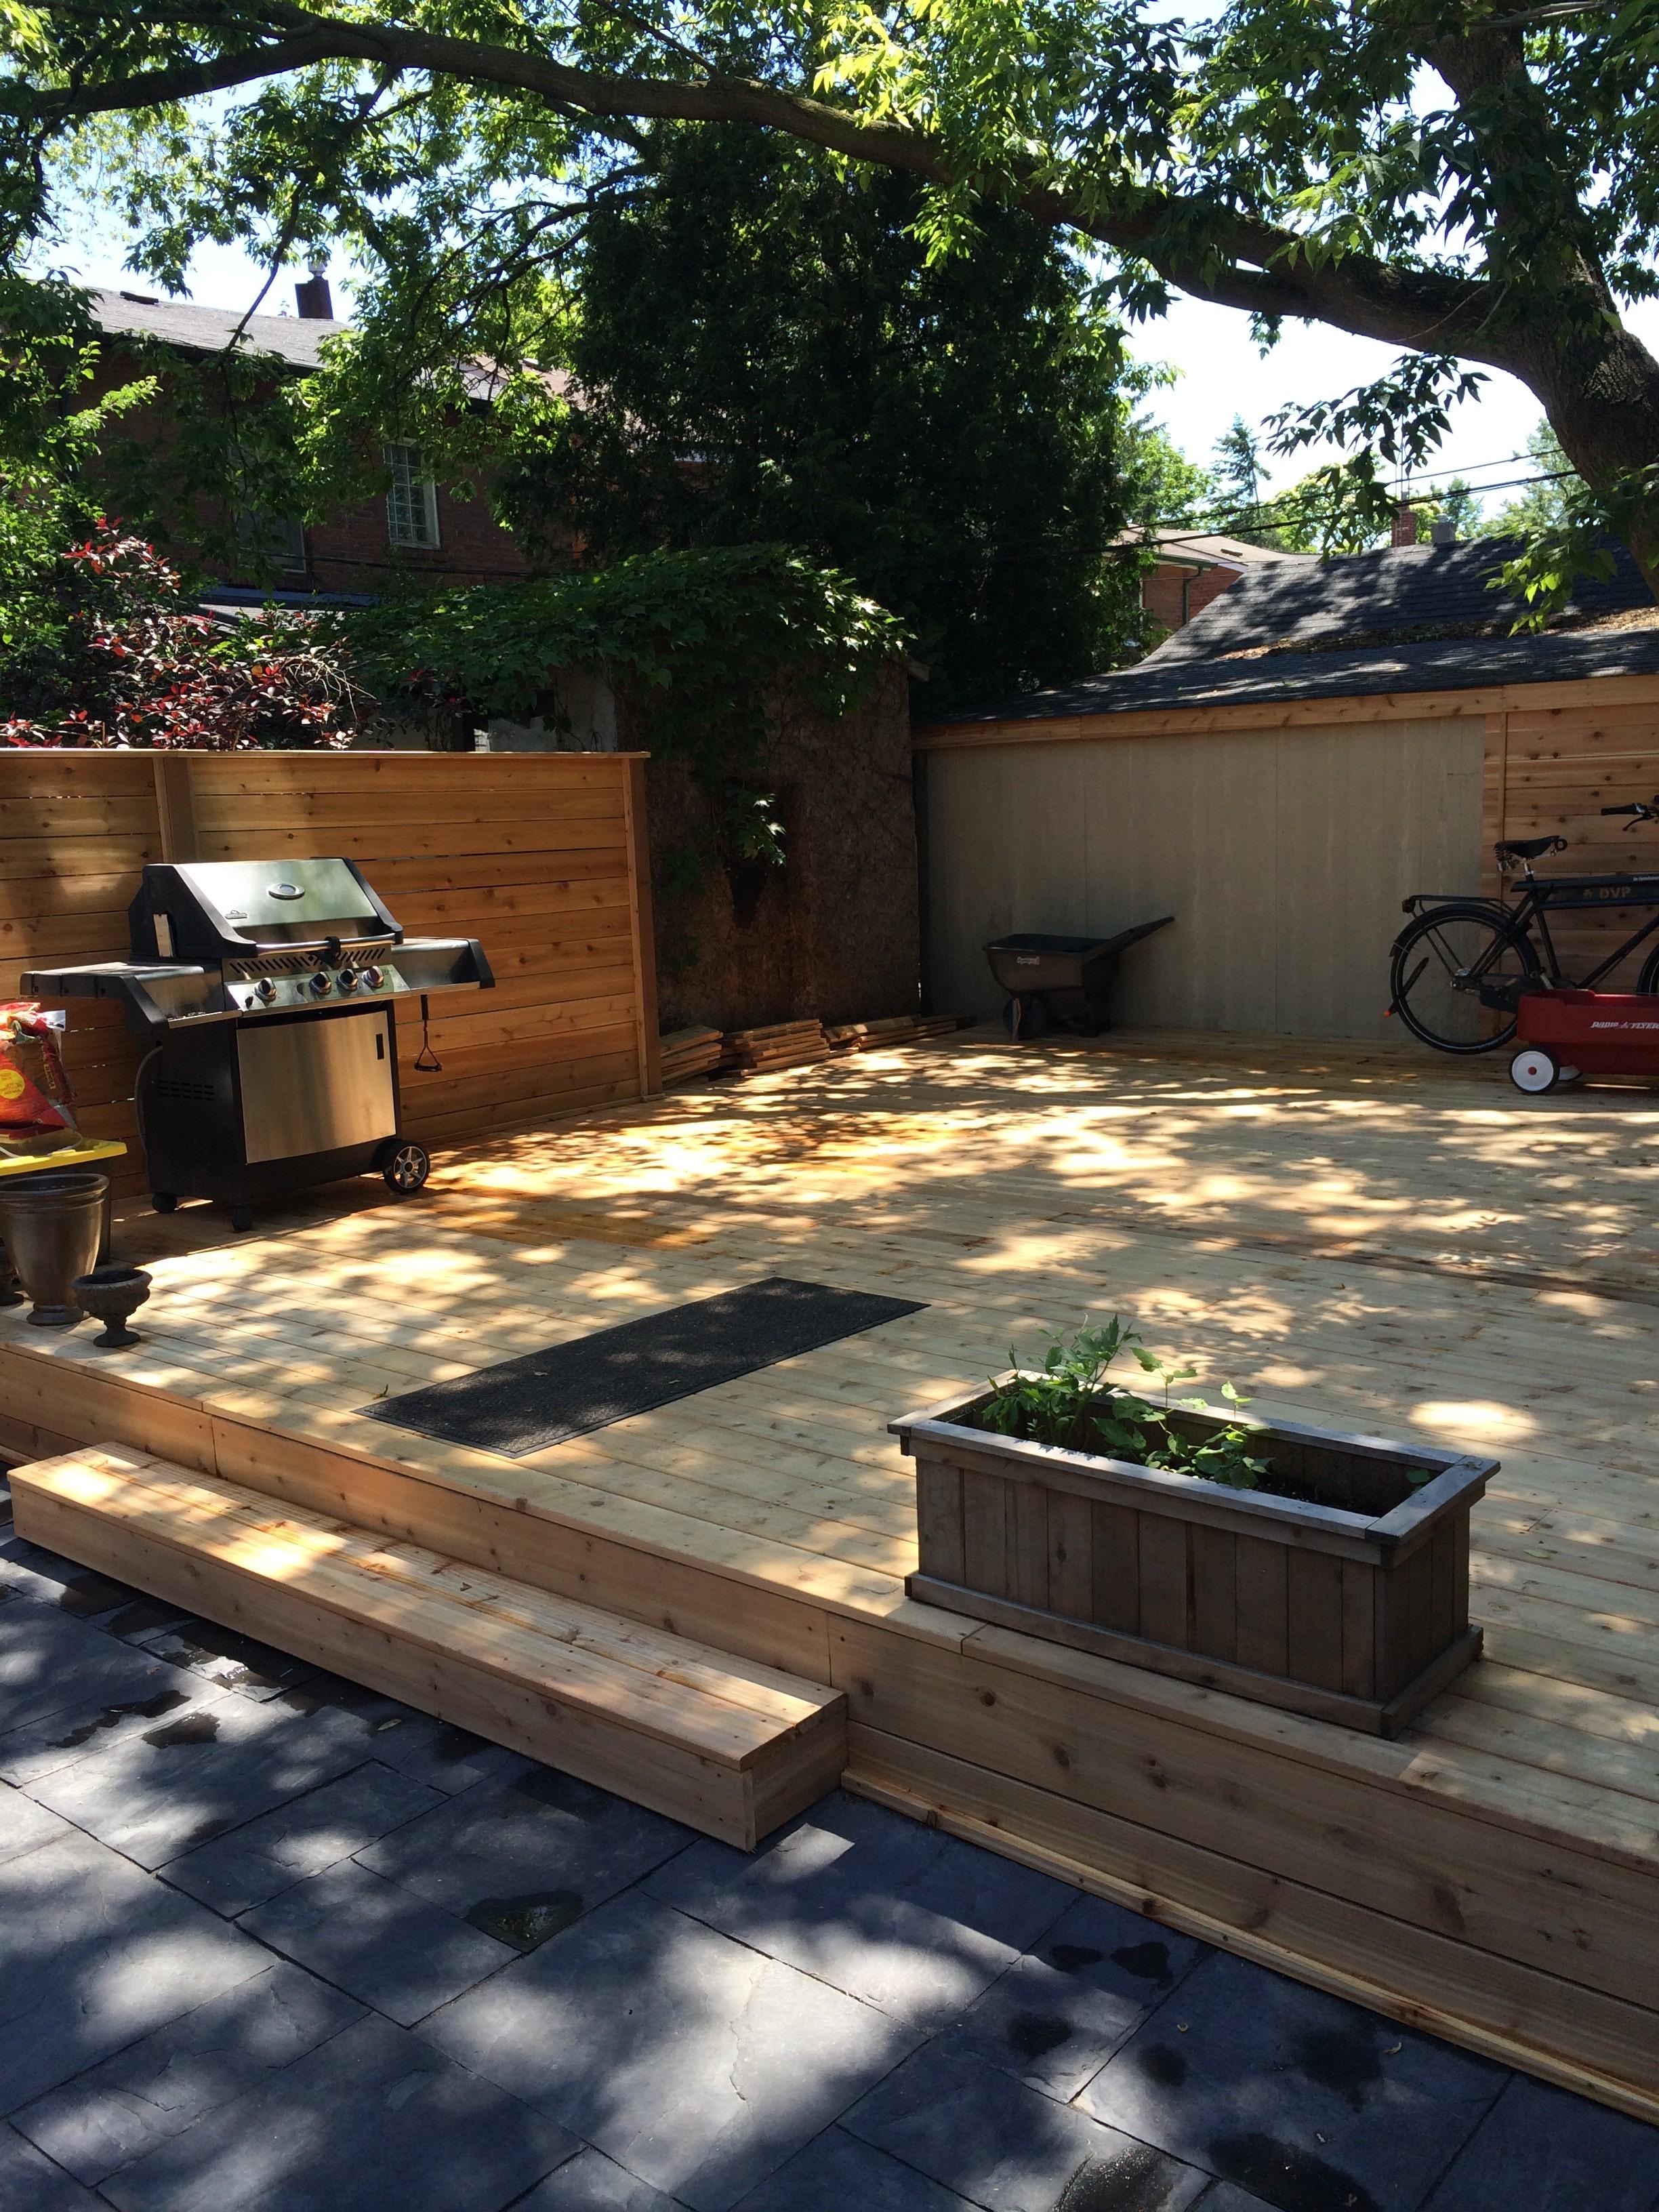 Cams Construction - Landscape deck and patio (138)